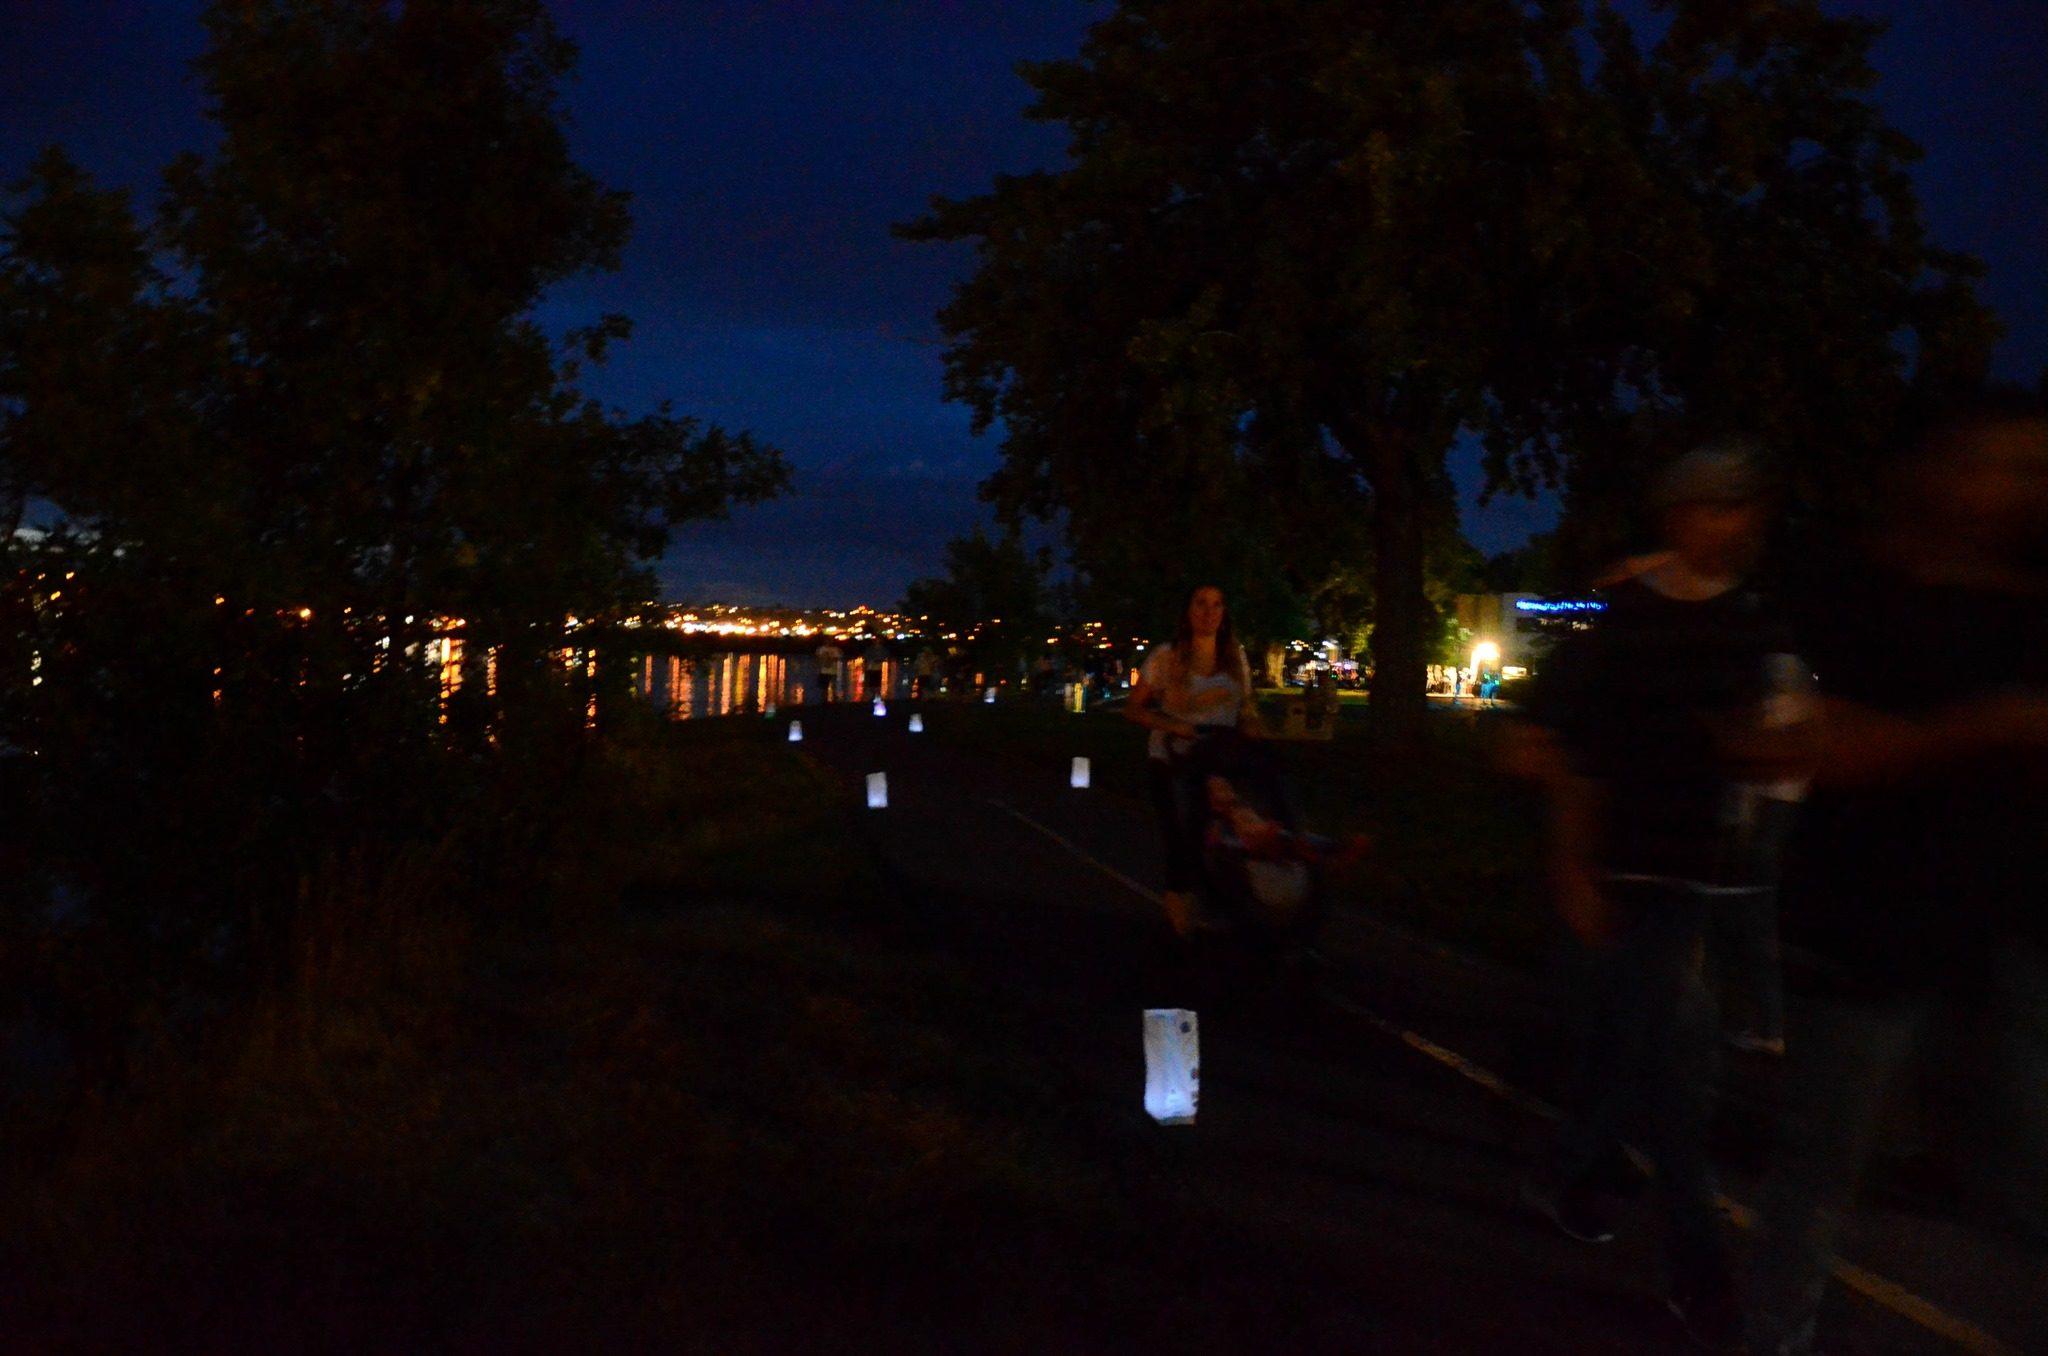 luminaria walk